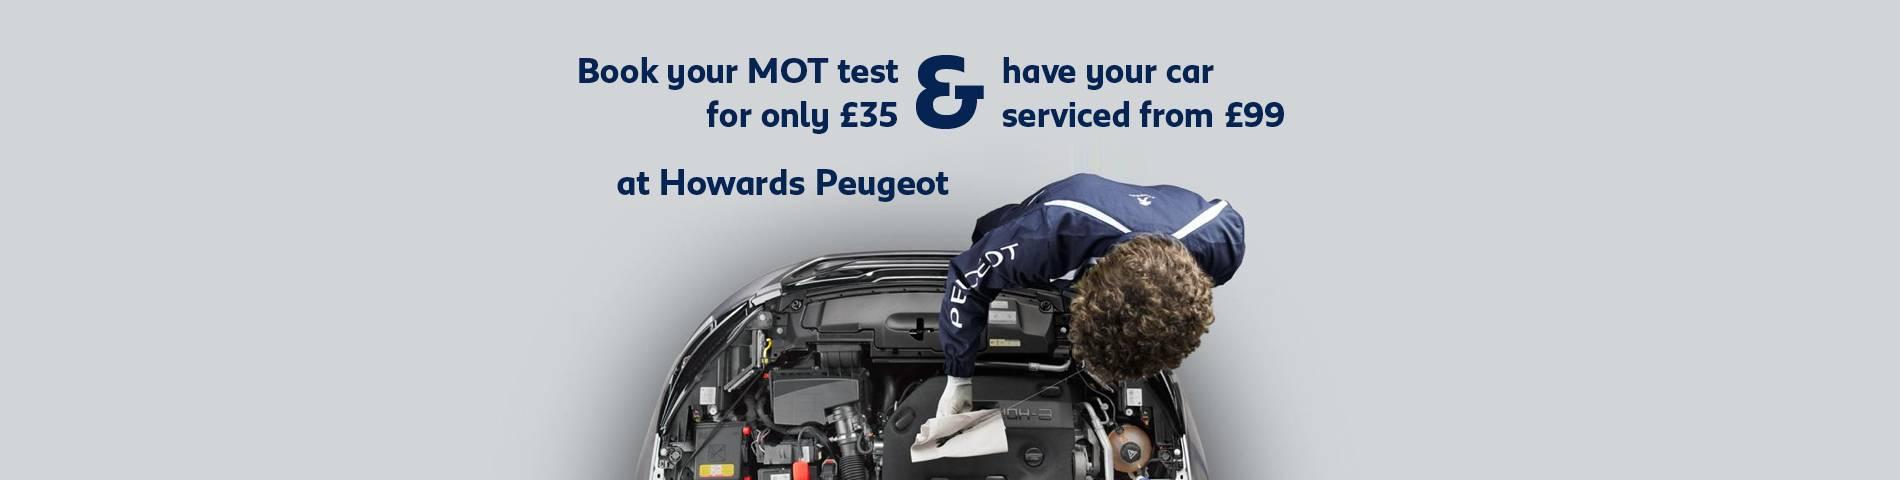 Peugeot MOT & Service